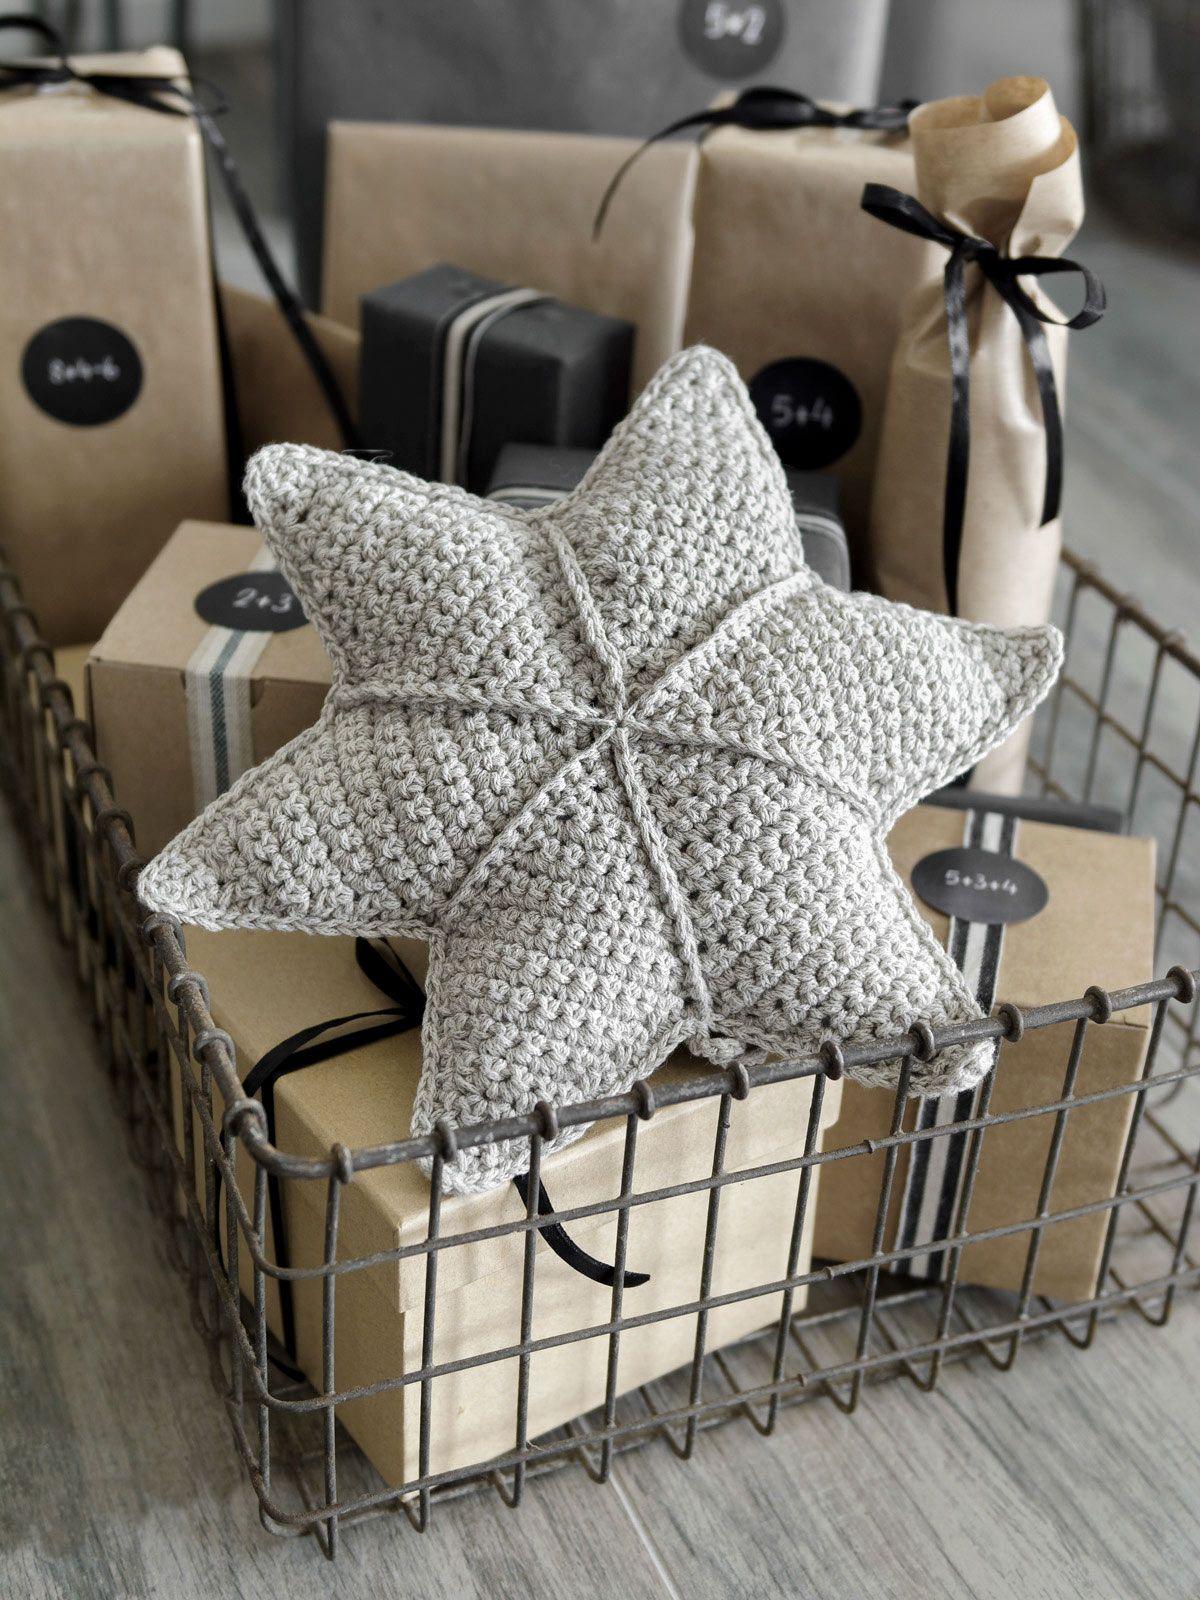 Diy Crochet Häkeln Pinterest Häkeln Stern Häkeln Und Stricken